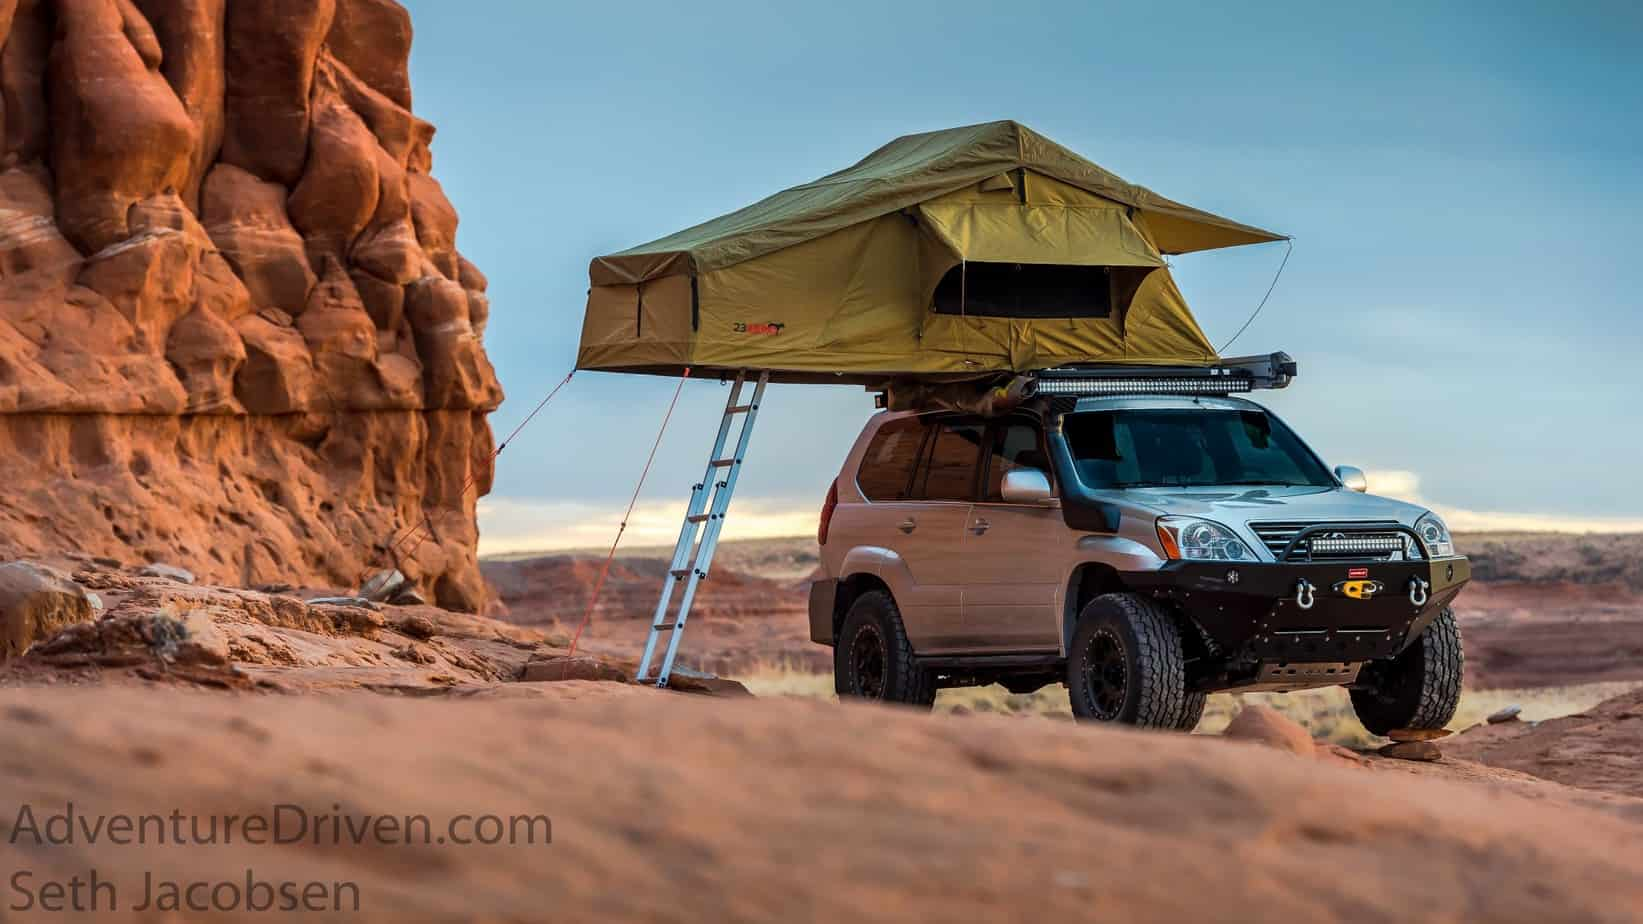 Adventure Driven  Lexy on rock 23 Zero tent-1